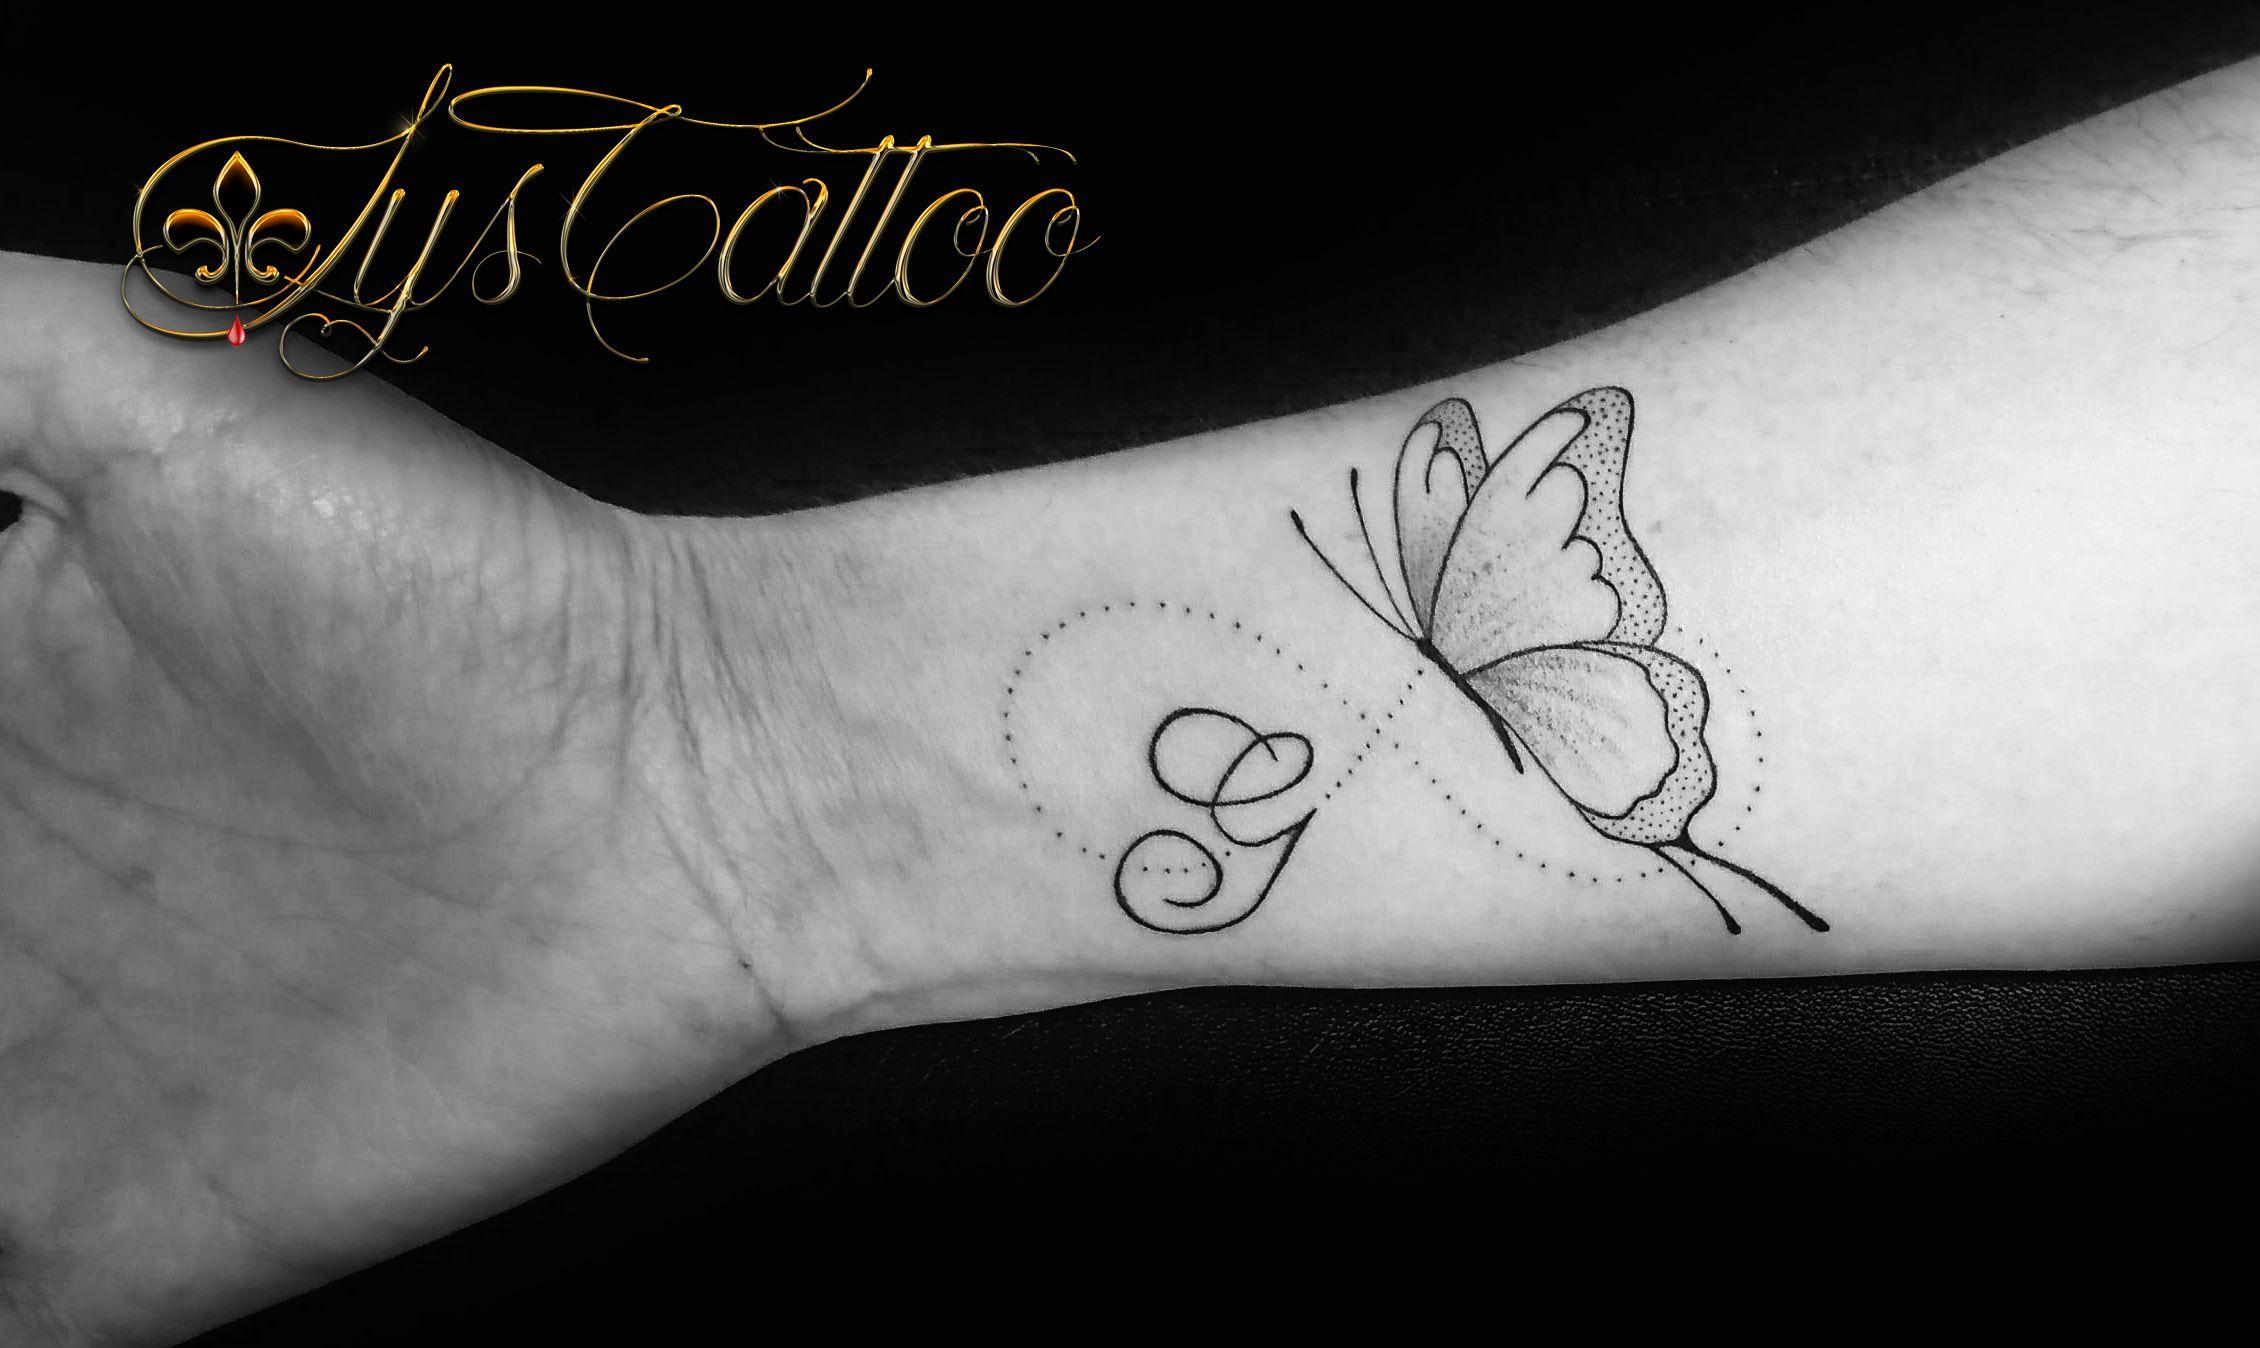 tatouage avant bras femme poignet fille girl tattoo. Black Bedroom Furniture Sets. Home Design Ideas